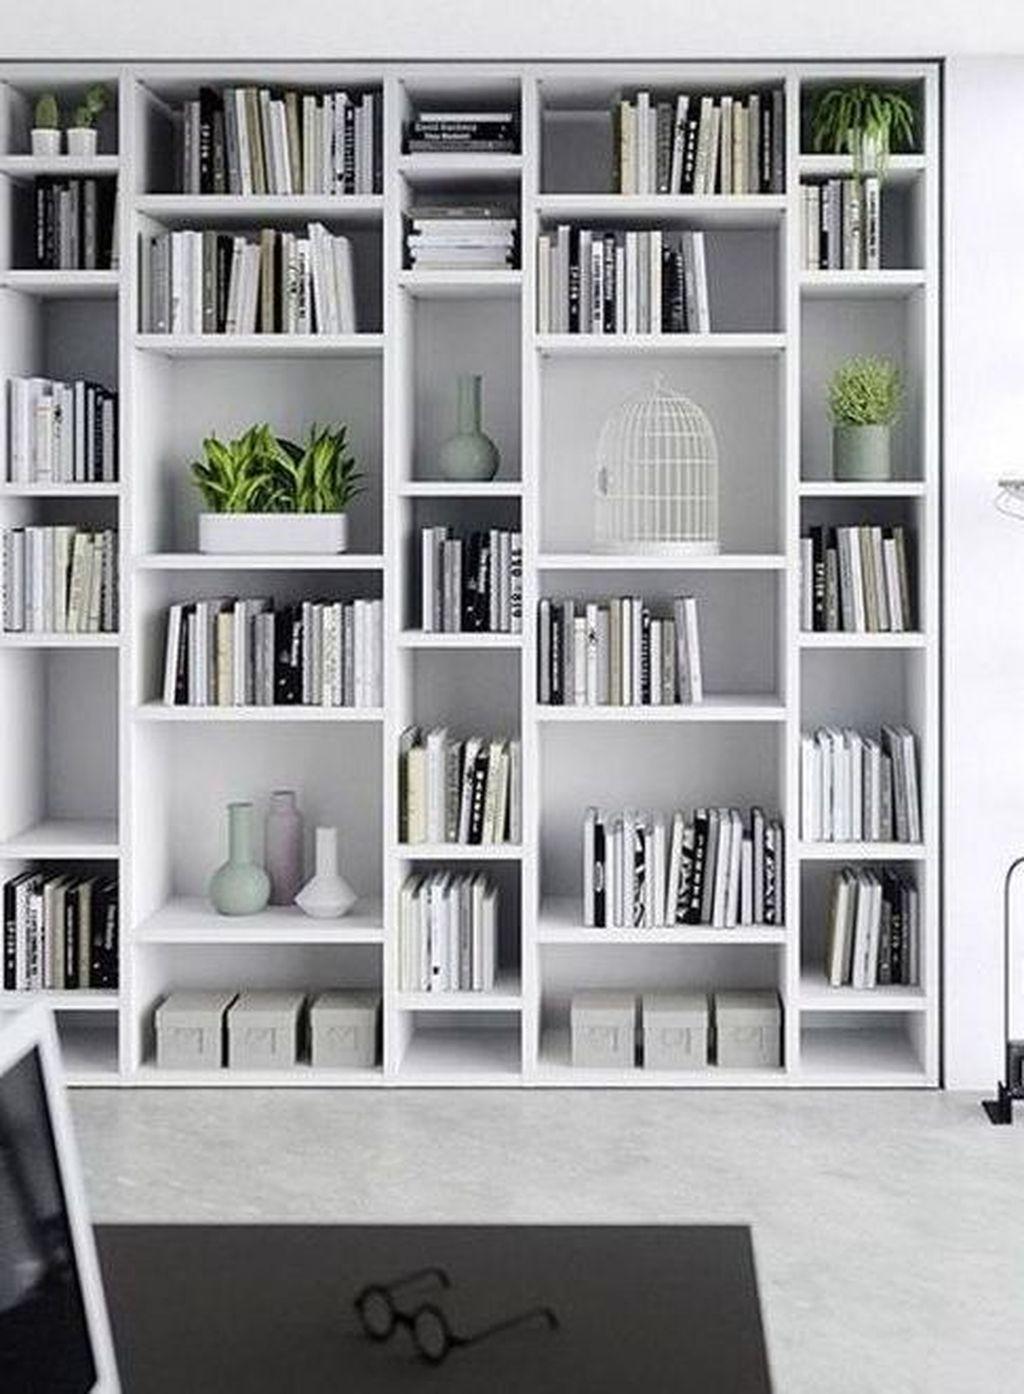 Library Sitting Room Ideas: 32 Stunning Bookshelf Design Ideas For A Minimalist Home